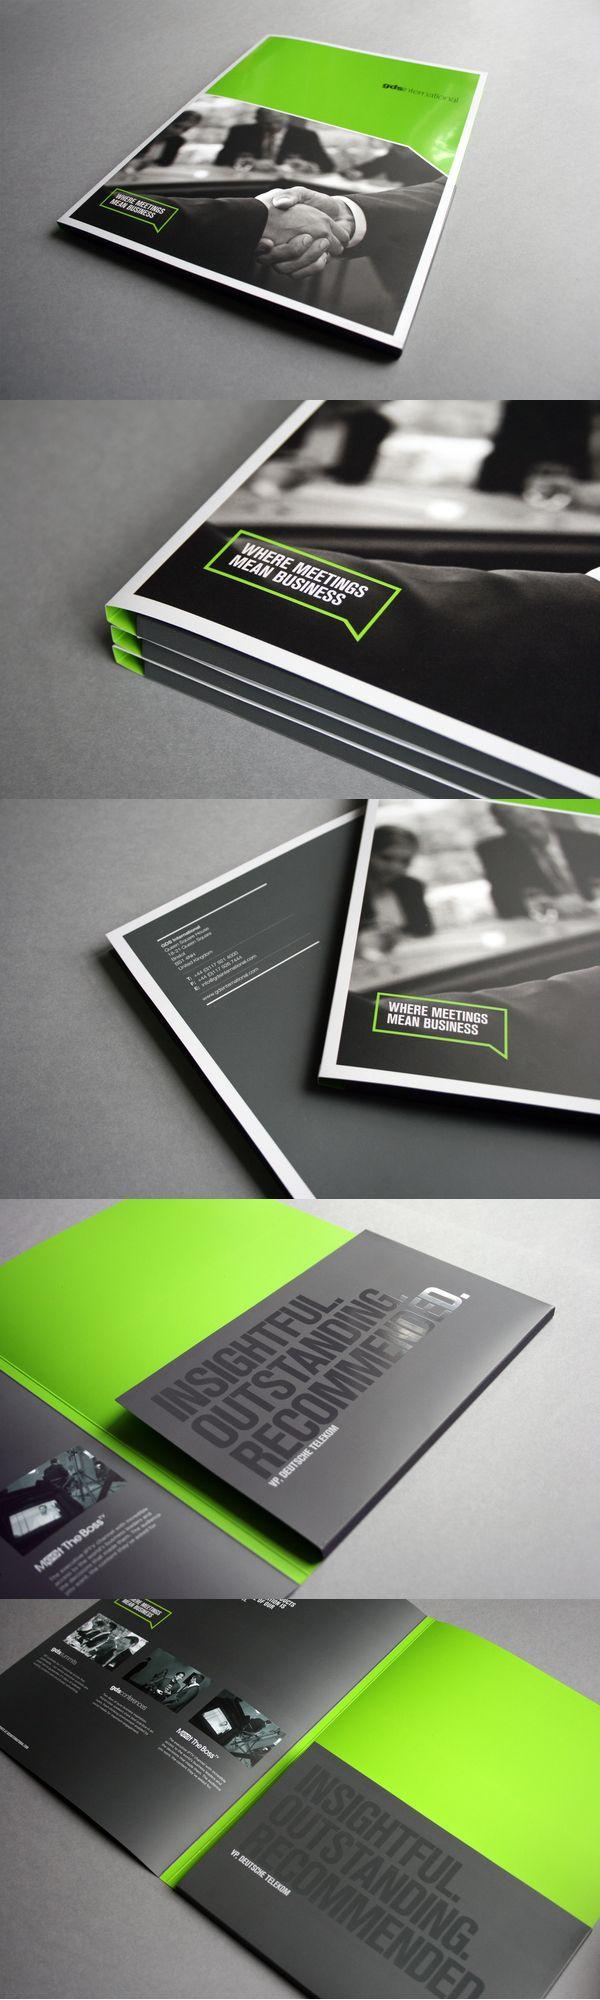 Editorial Design // Grün / Schwarz / Blickfang